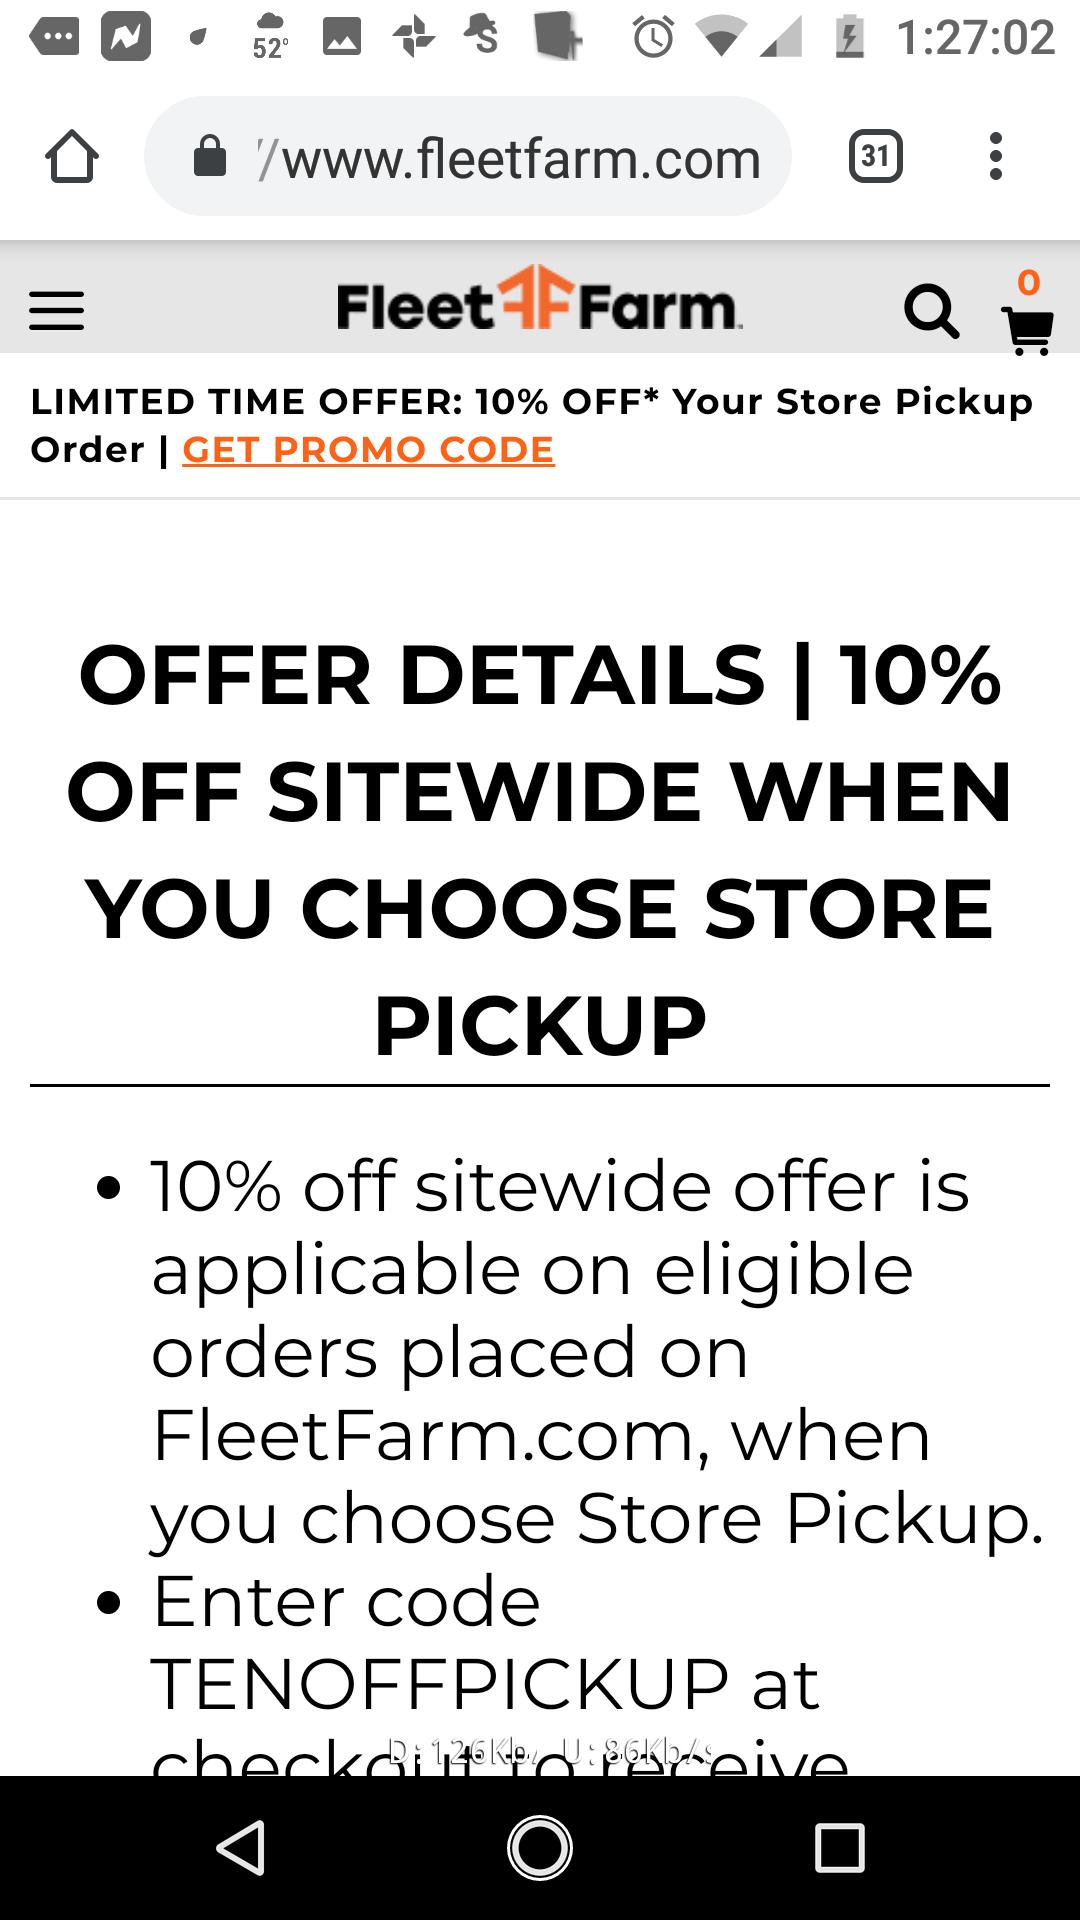 Mills Fleet Farm Promo Code >> Fleet Farm 10 Off Sitewide When You Choose Store Pickup